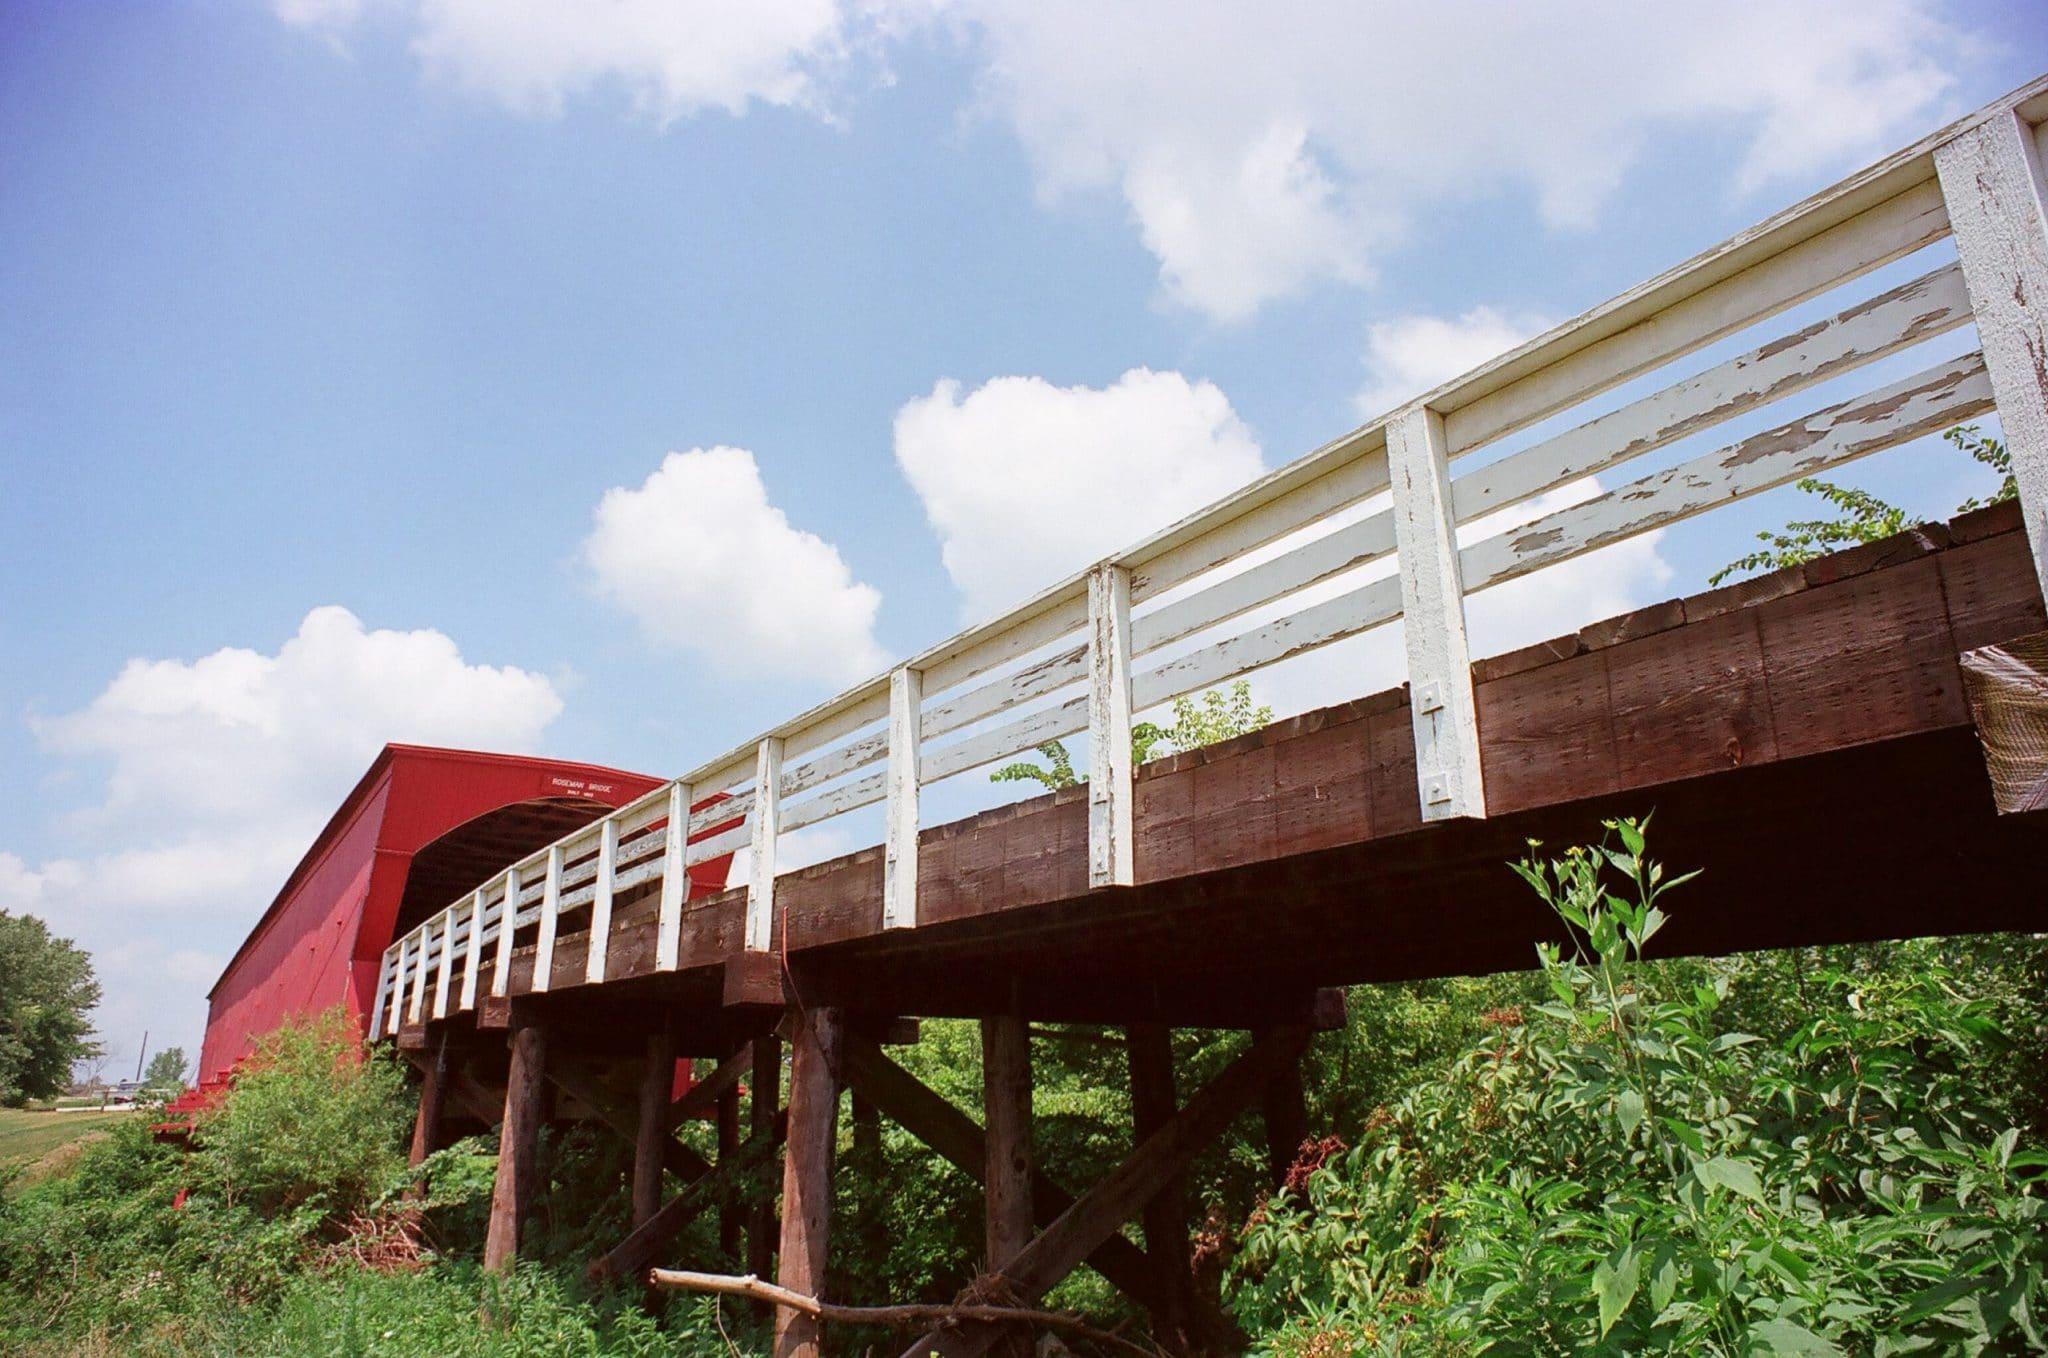 Iowa road trip: Bridges of Madison County